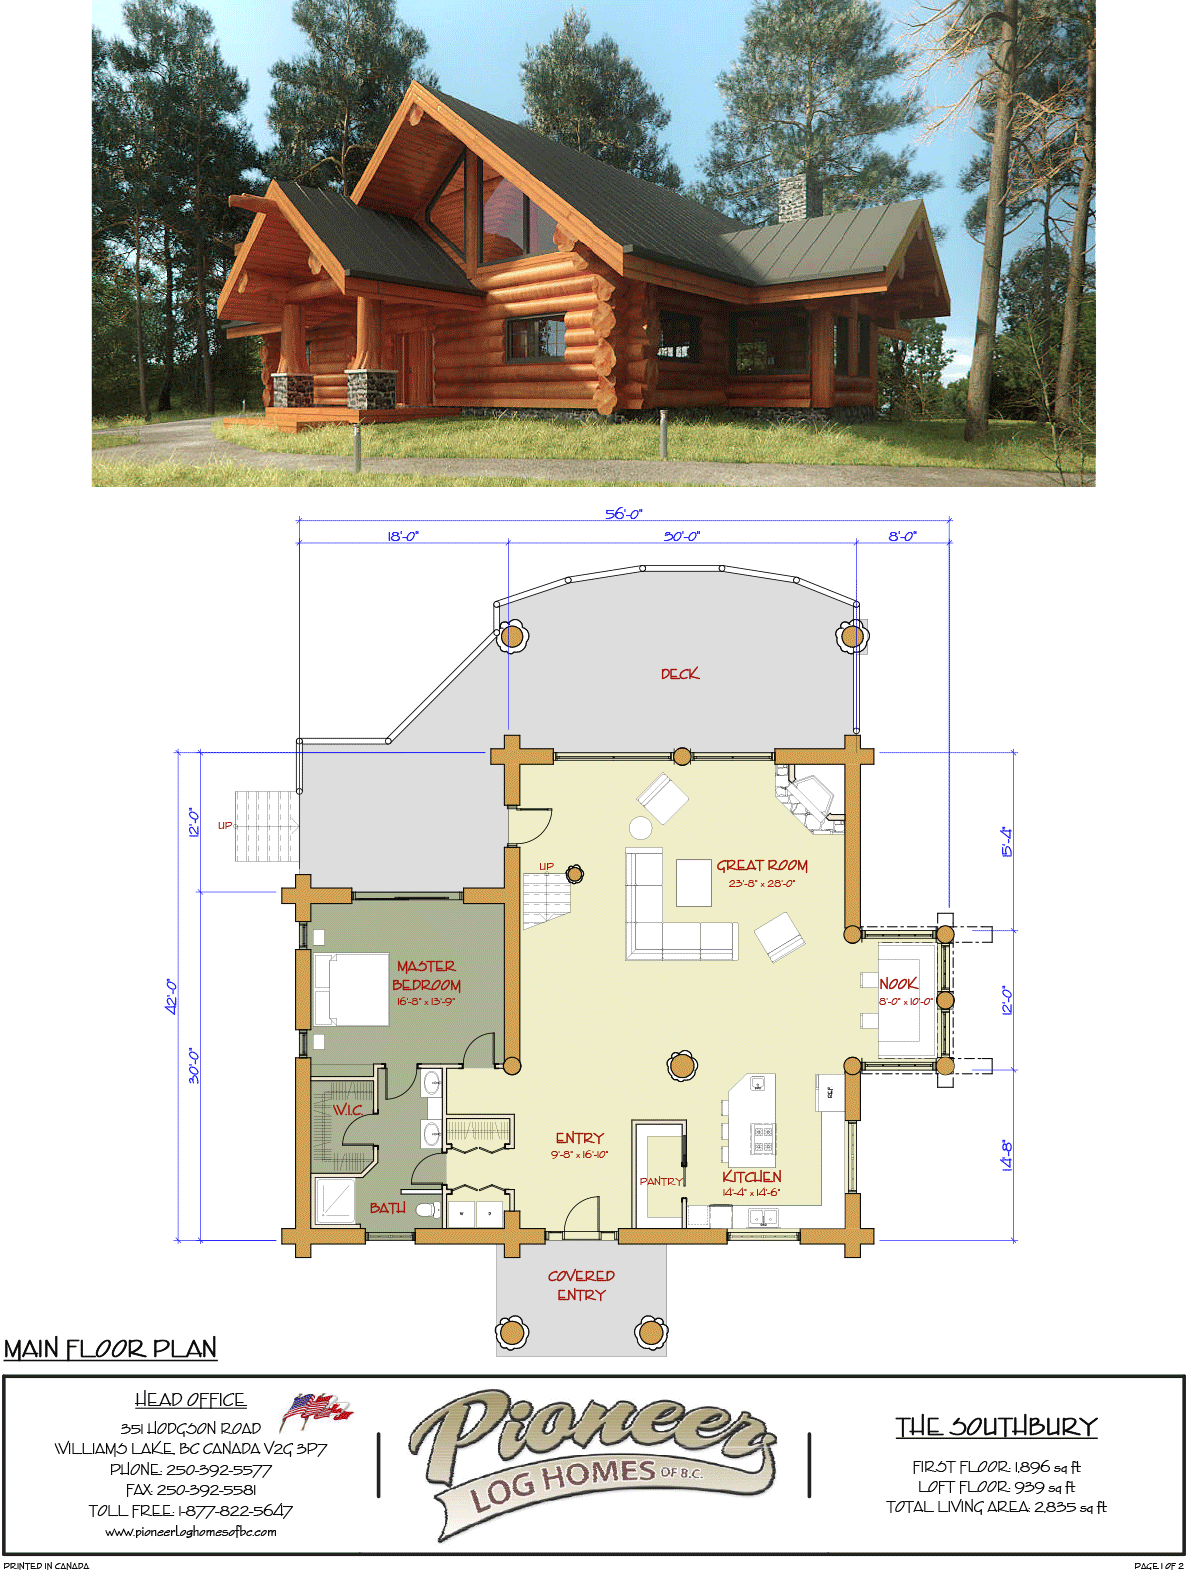 Southbury Pioneer Log Homes Midwest Log Home Floor Plans Log Home Plans Log Homes